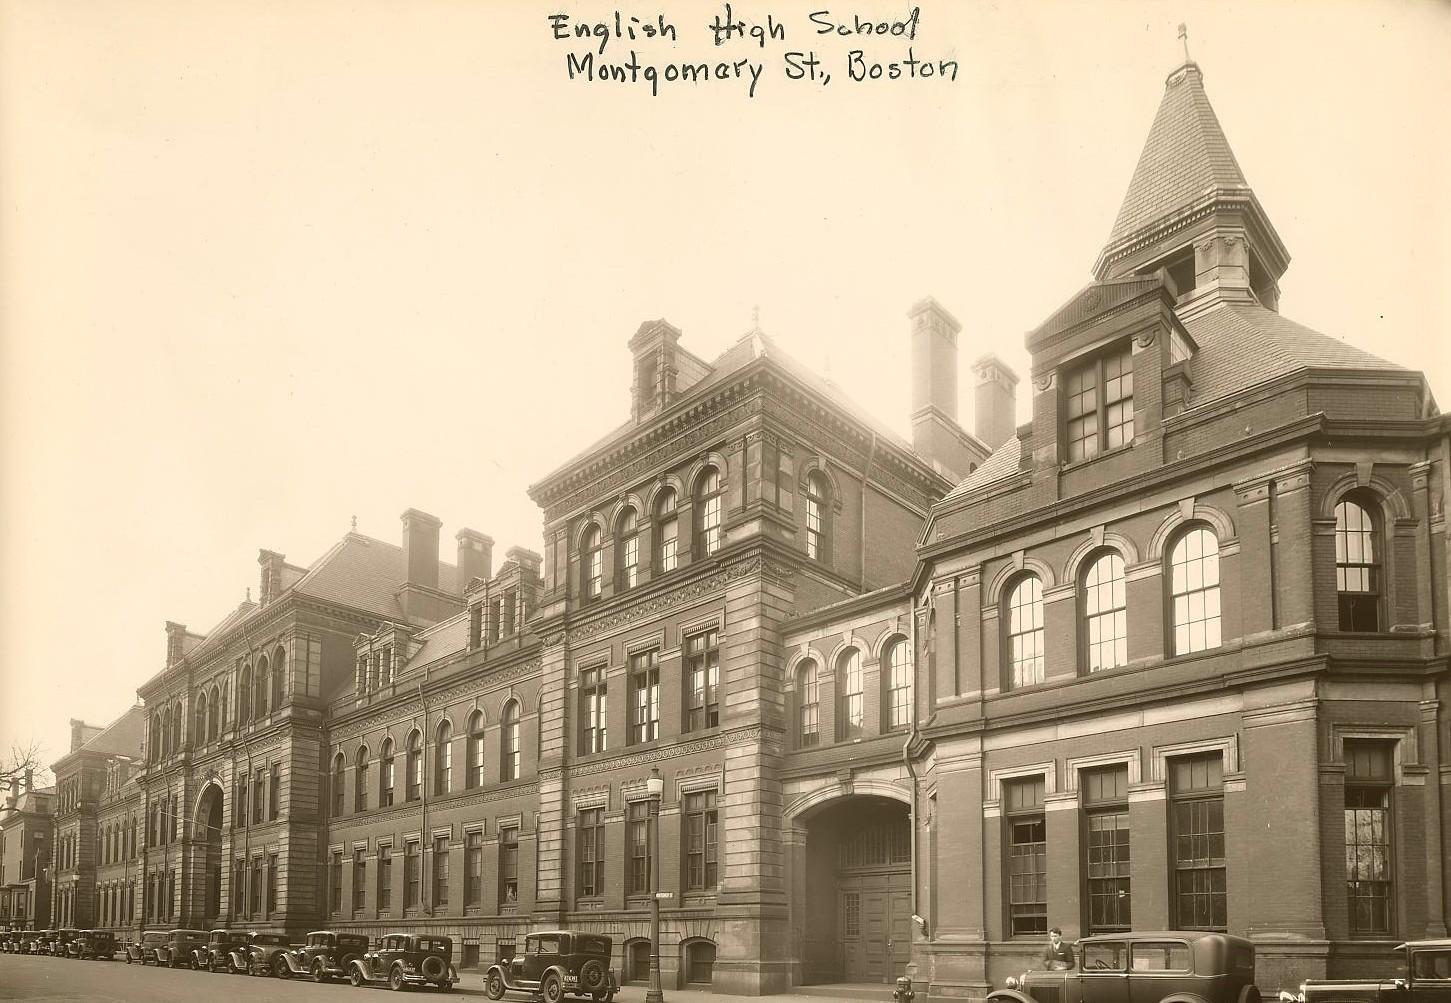 The English High School